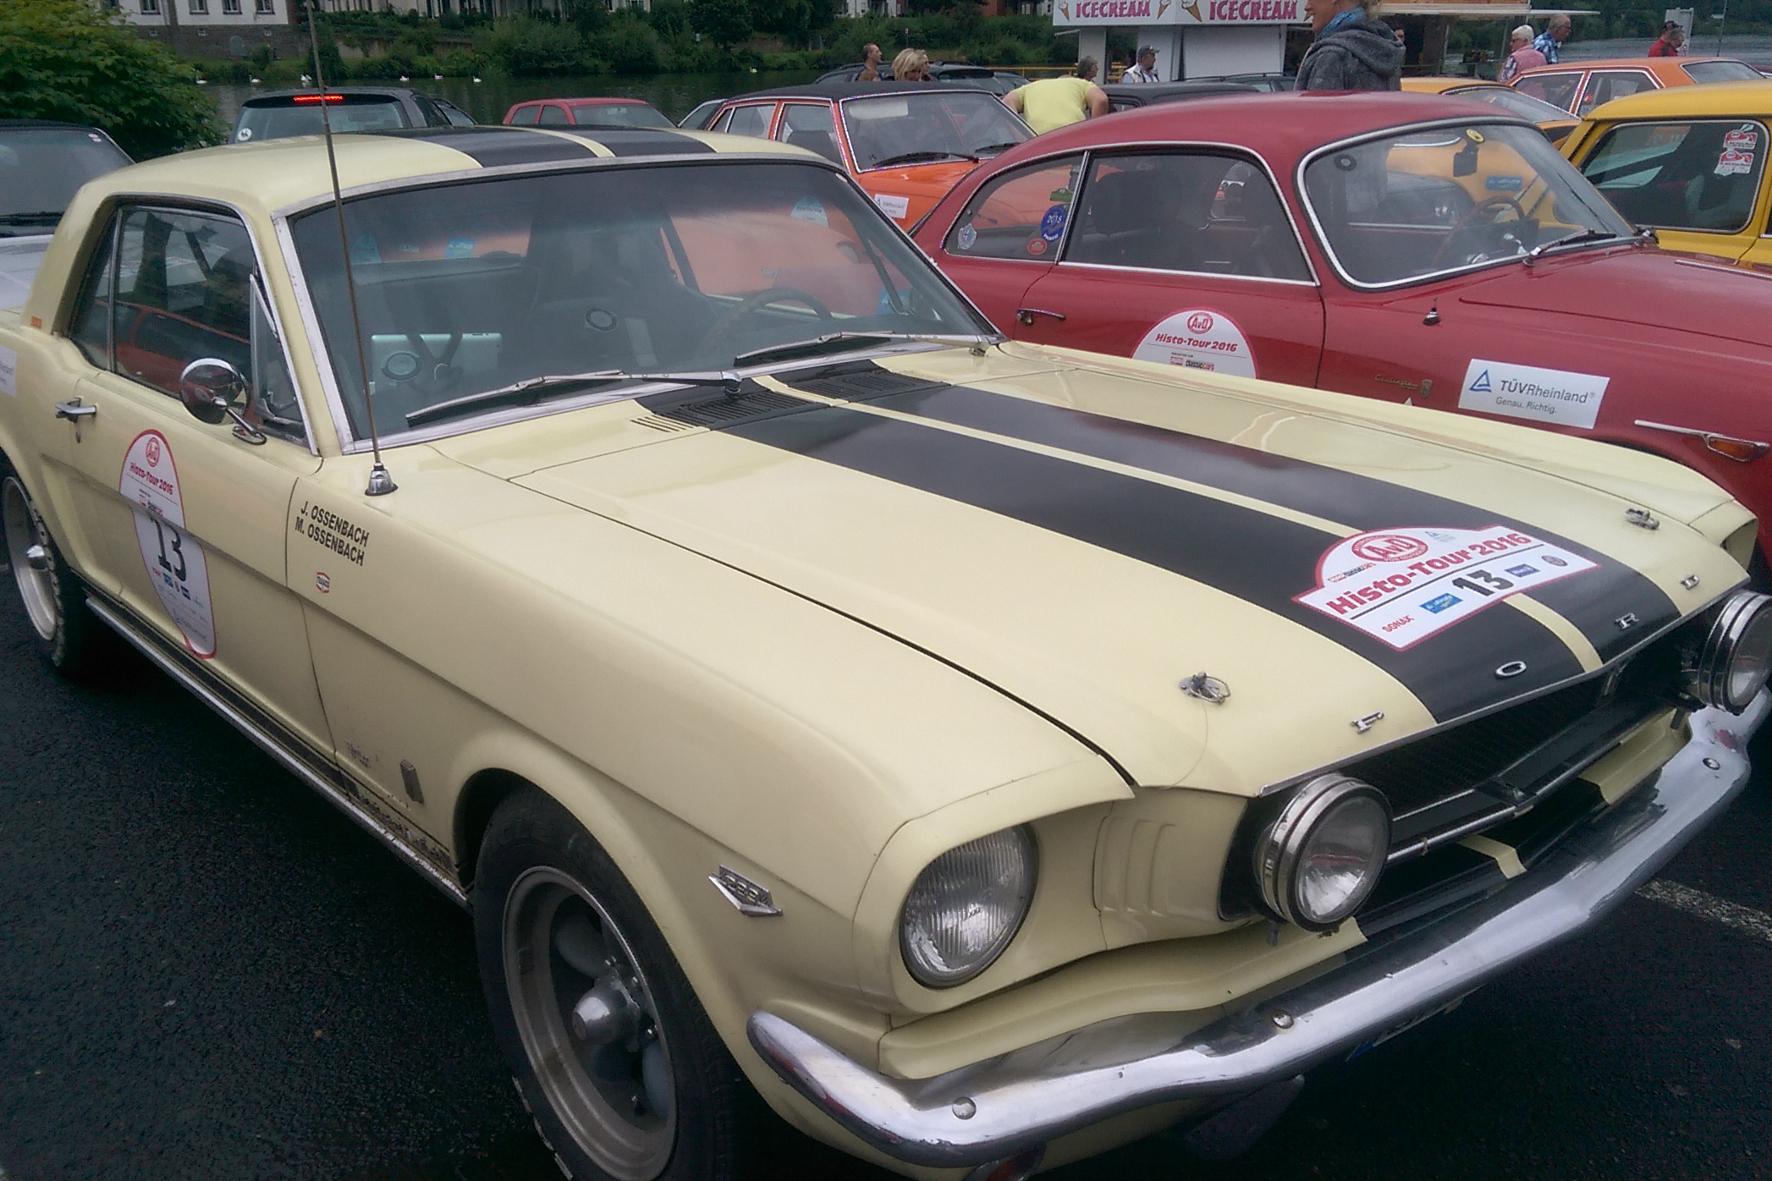 Nostalgie-Rallye mit rarer Reifenote